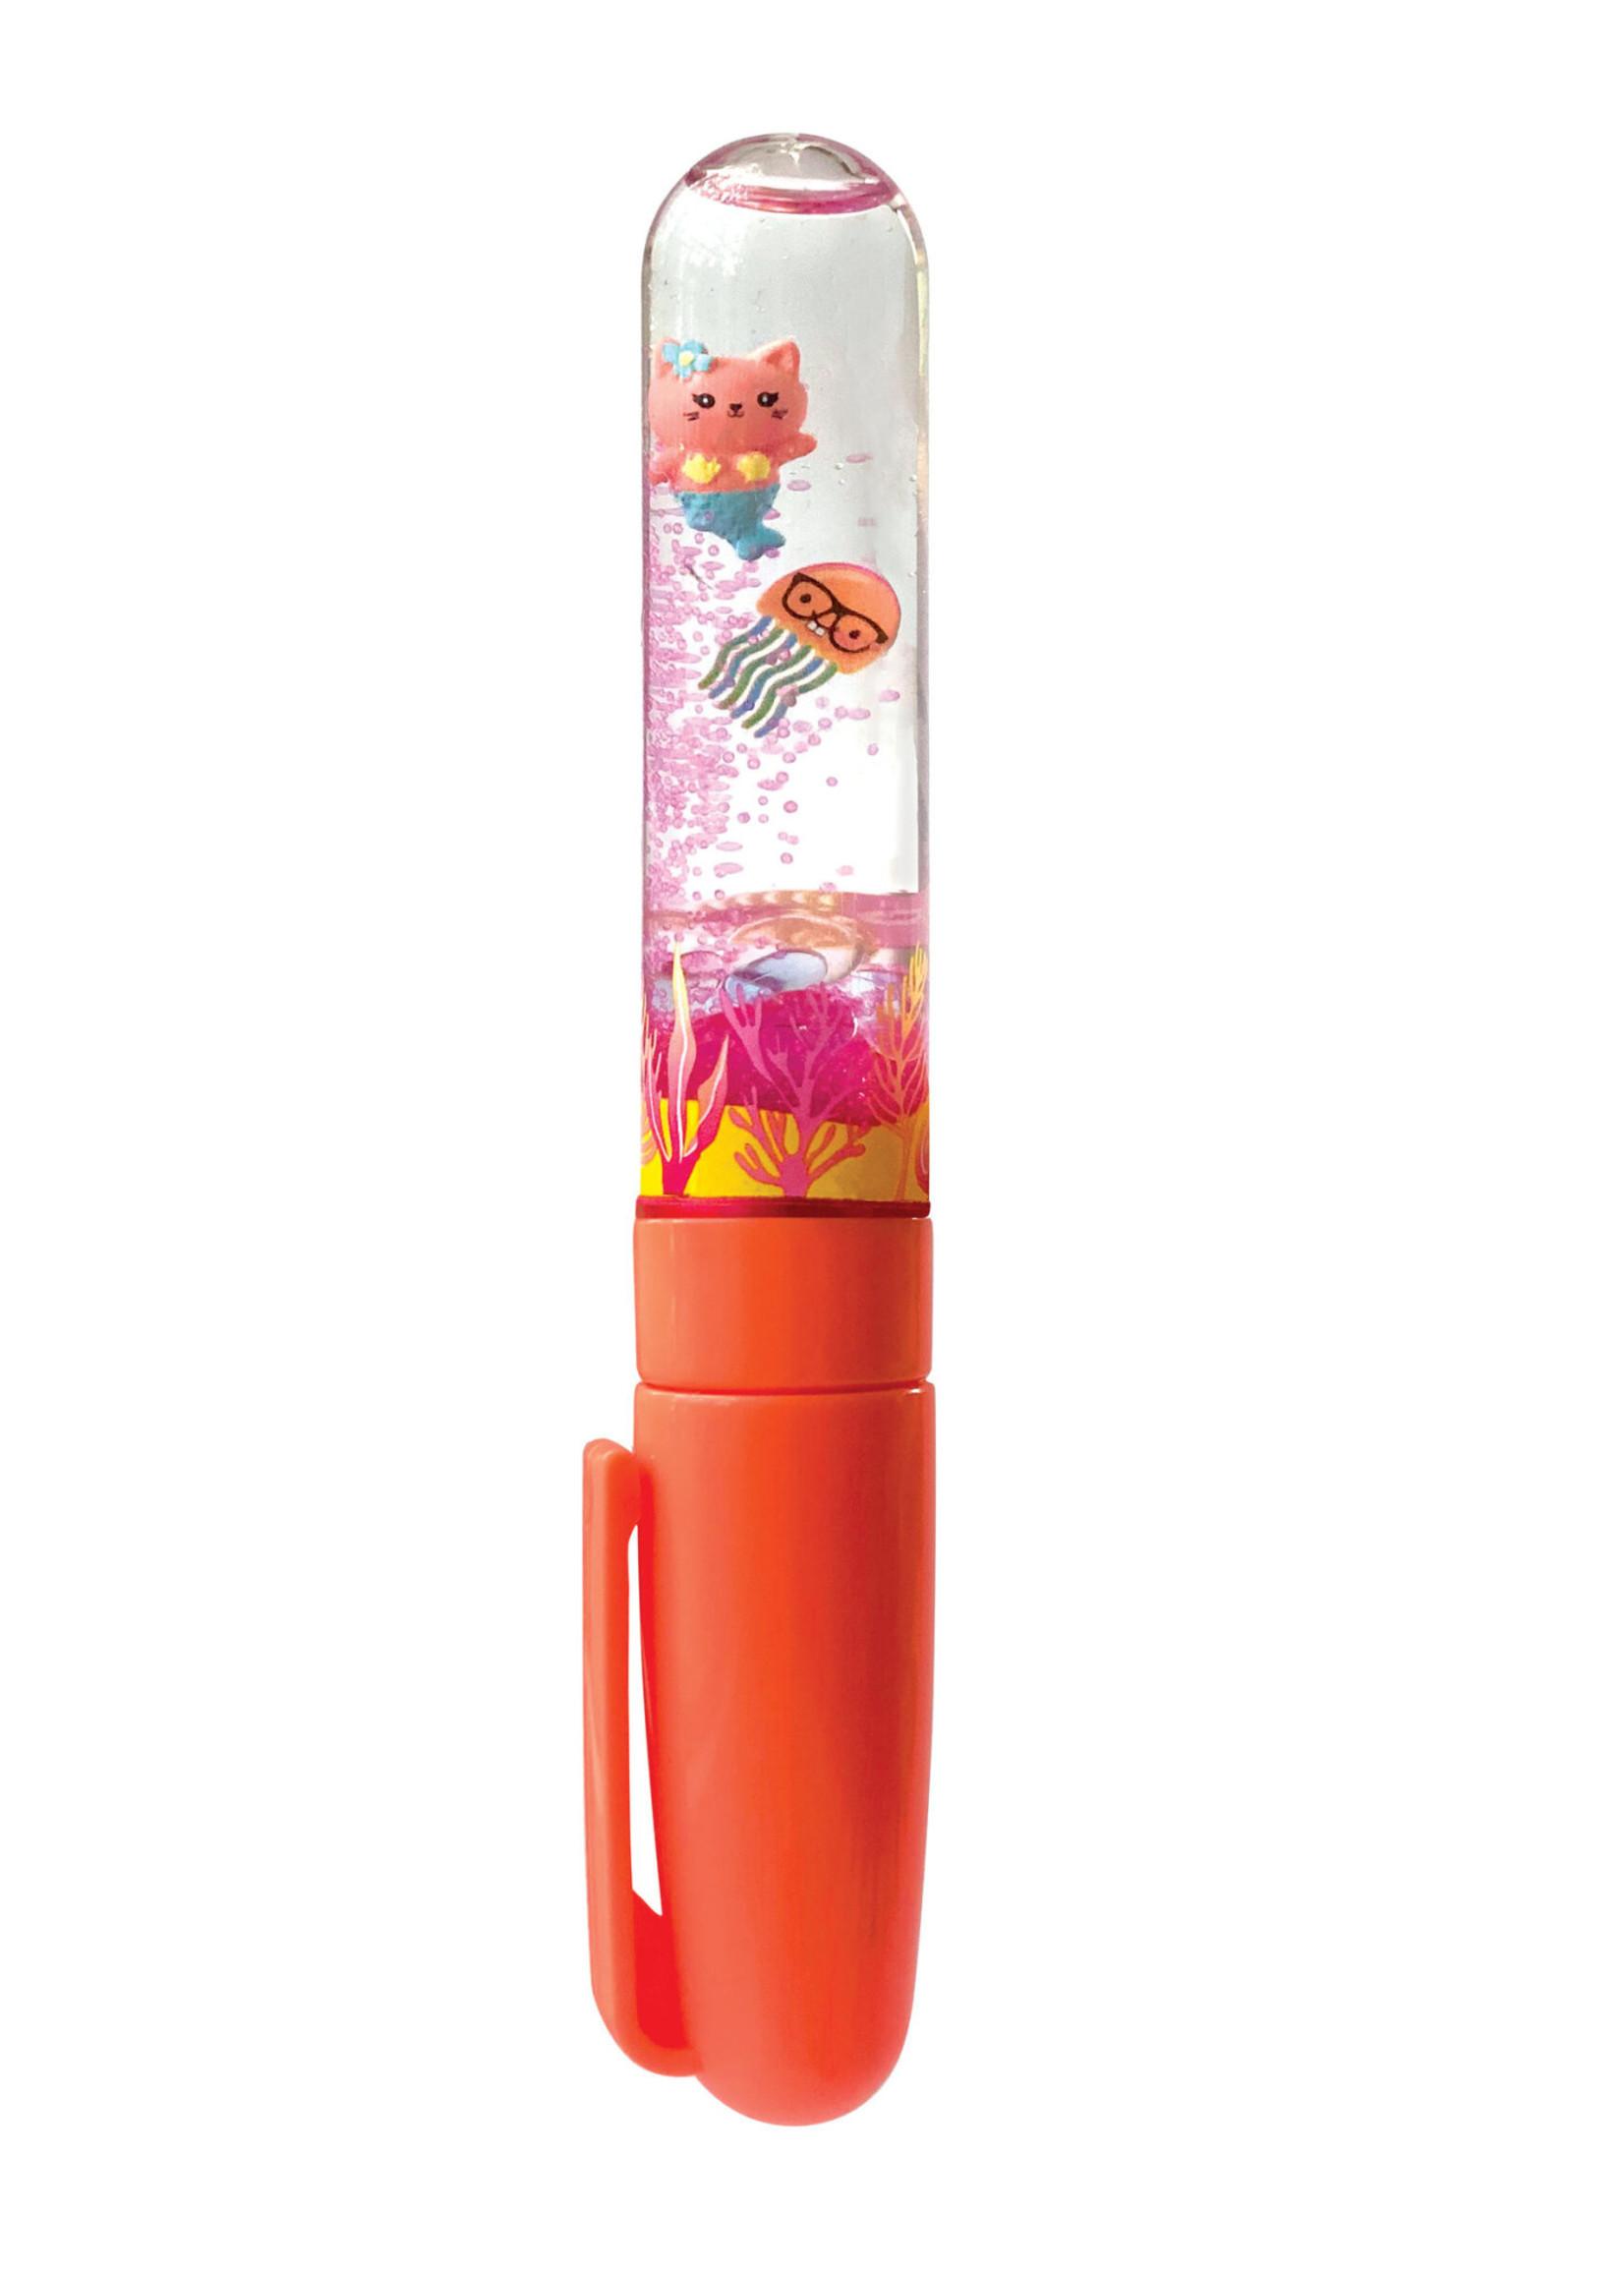 Bright Stripes Swirly World Liquid Glitter Pen